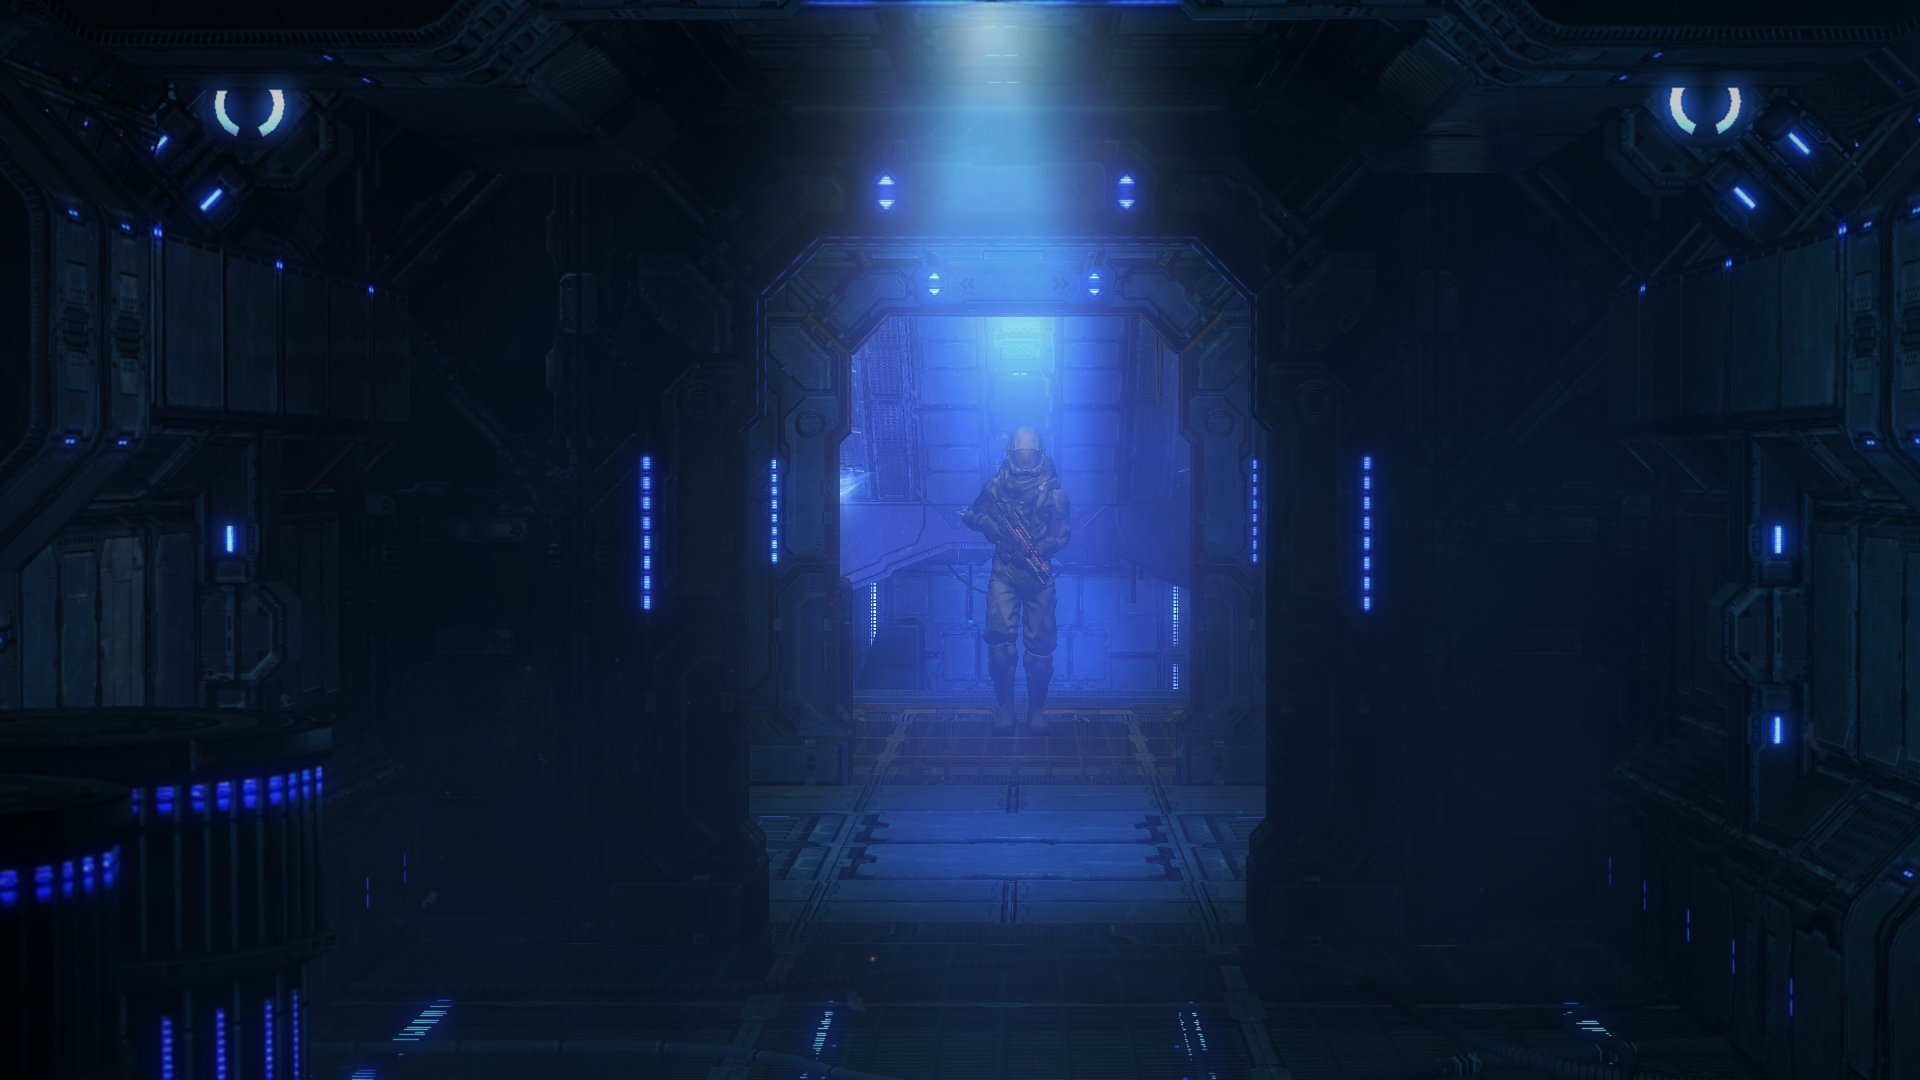 Screenshot showing a soldier walking in a dimly-lit hallway